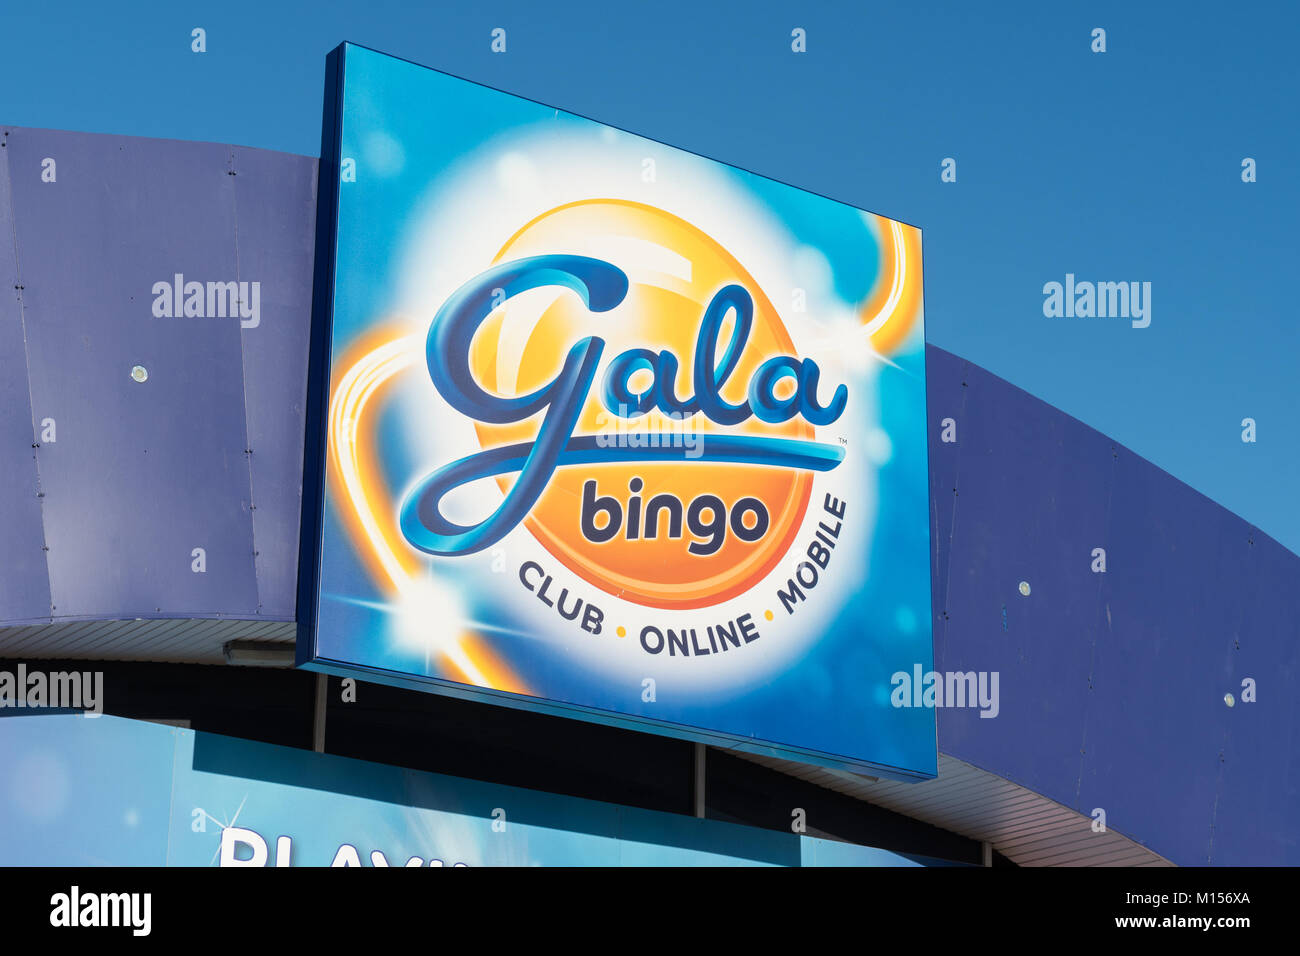 Gala bingo sign, Possilpark, Glasgow, Scotland, UK - Stock Image